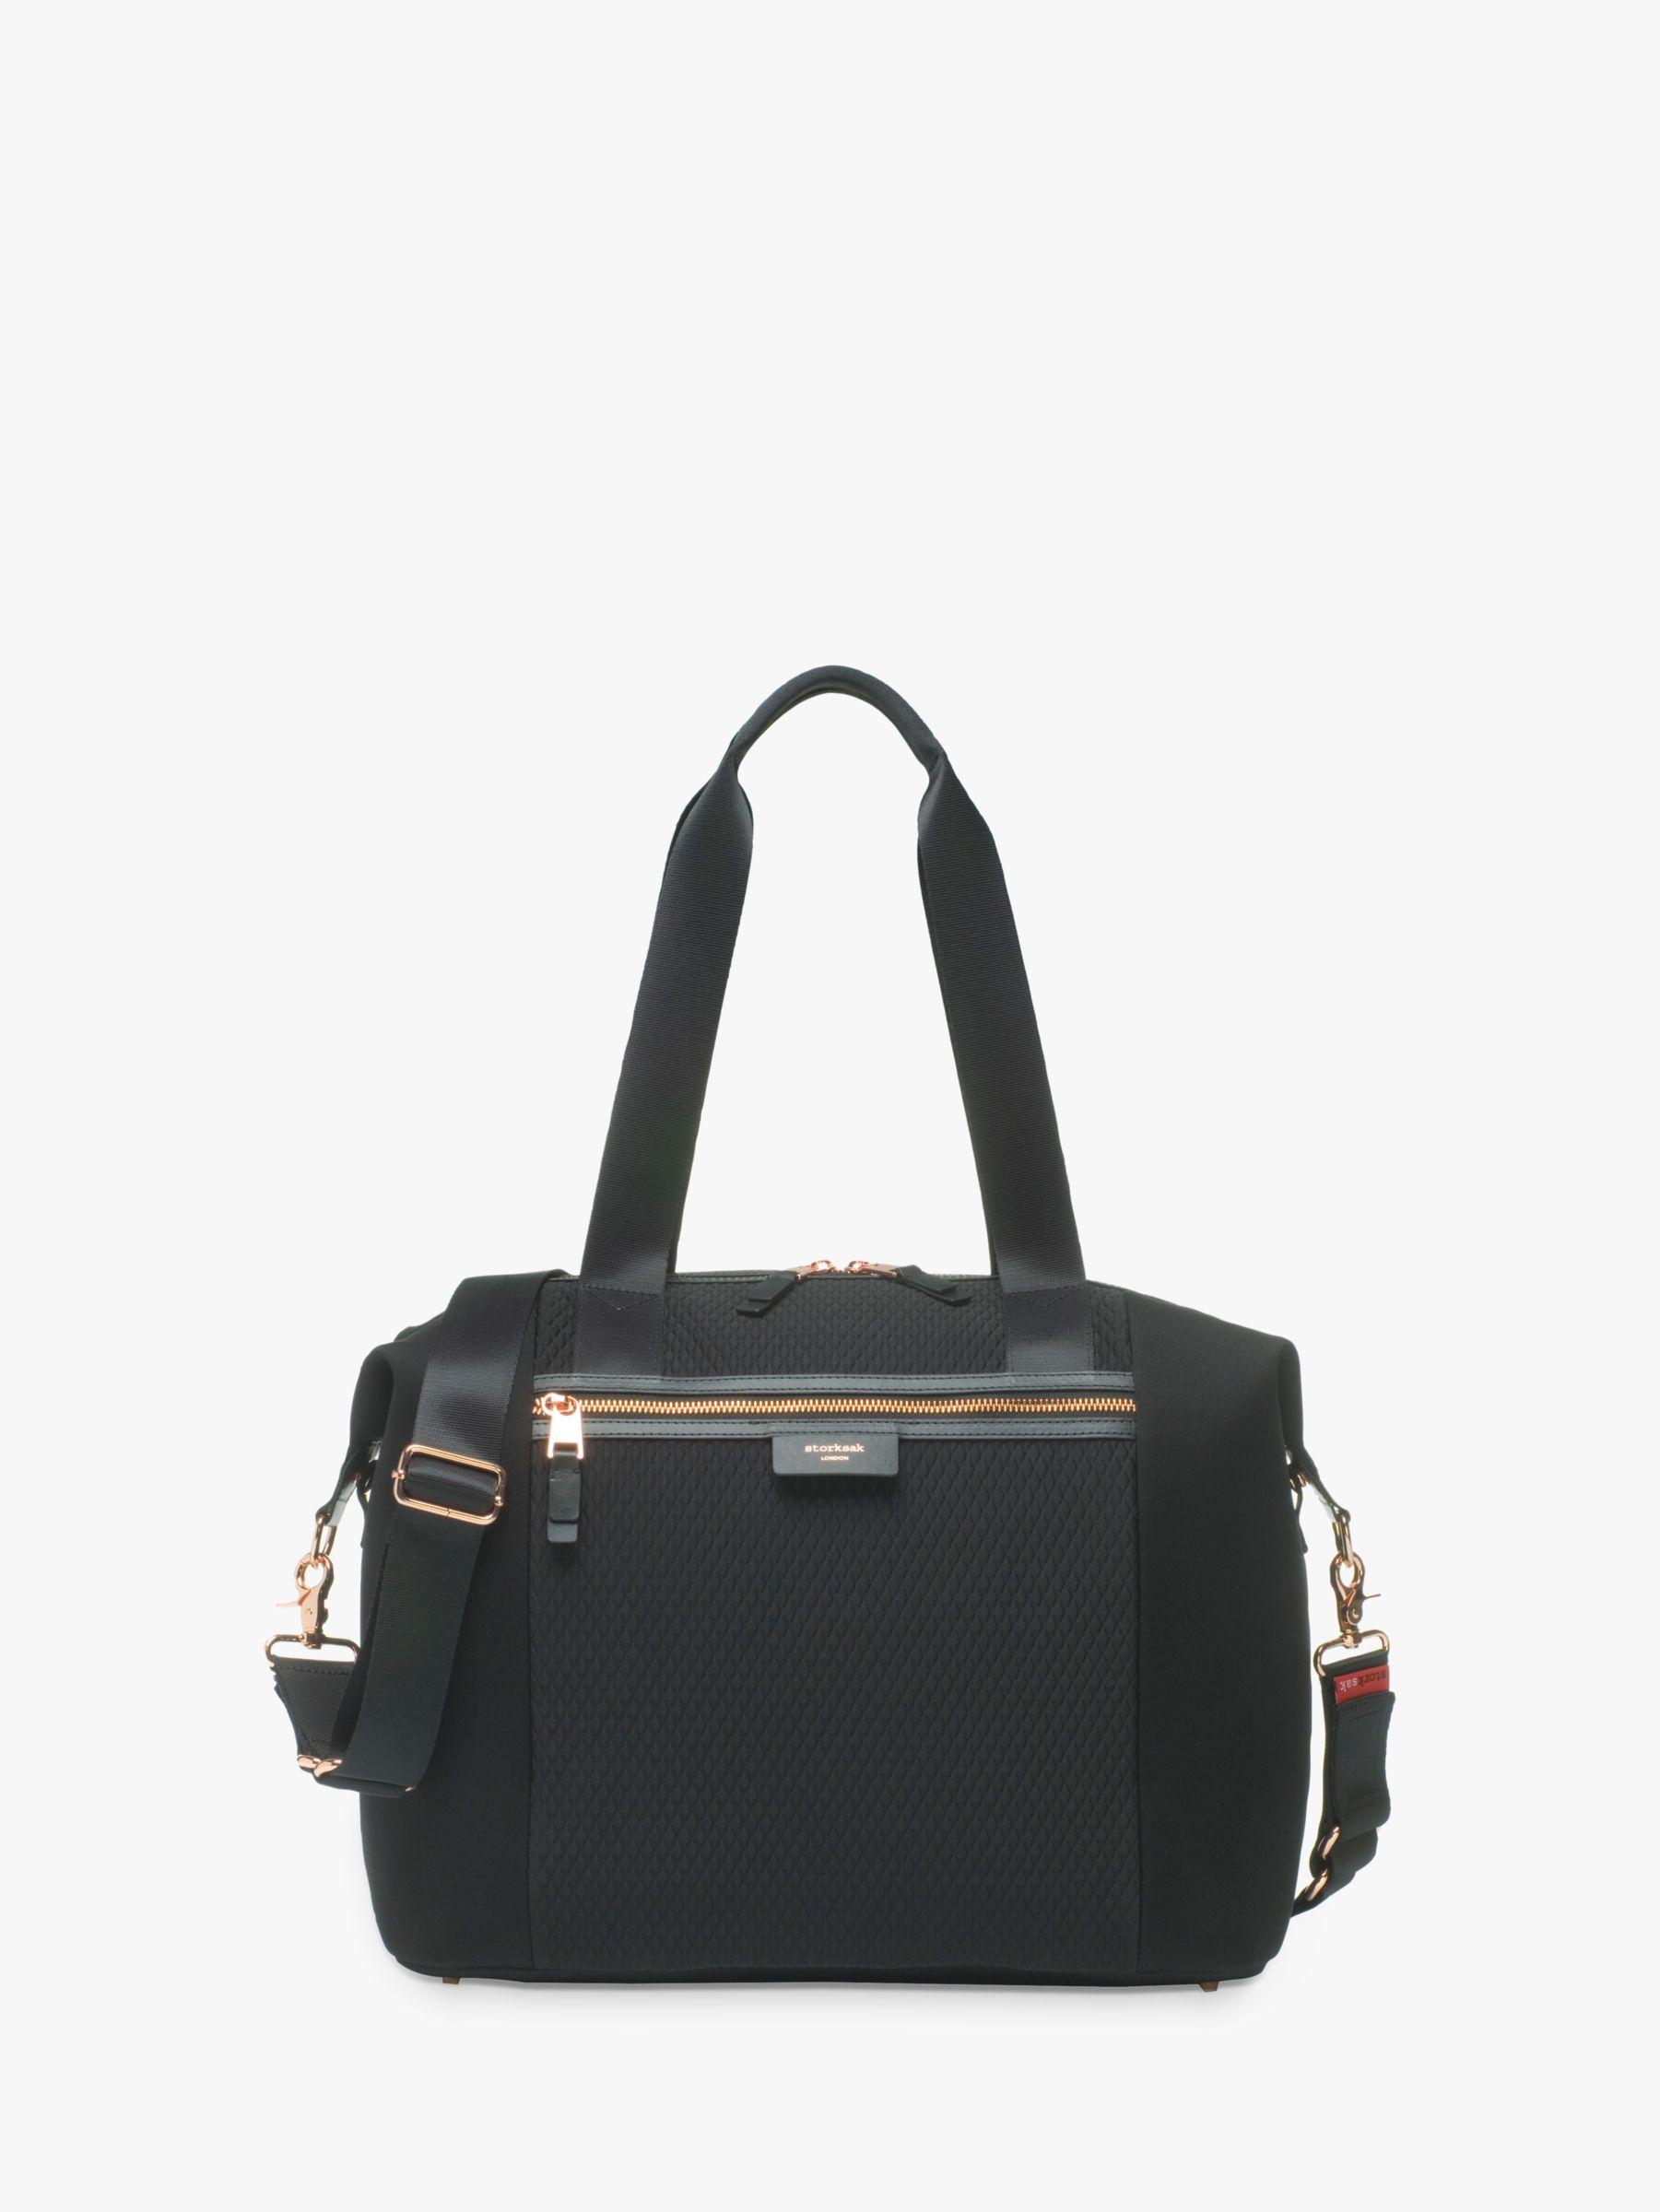 Storksak Storksak Stevie Luxe Changing Bag, Black Scuba